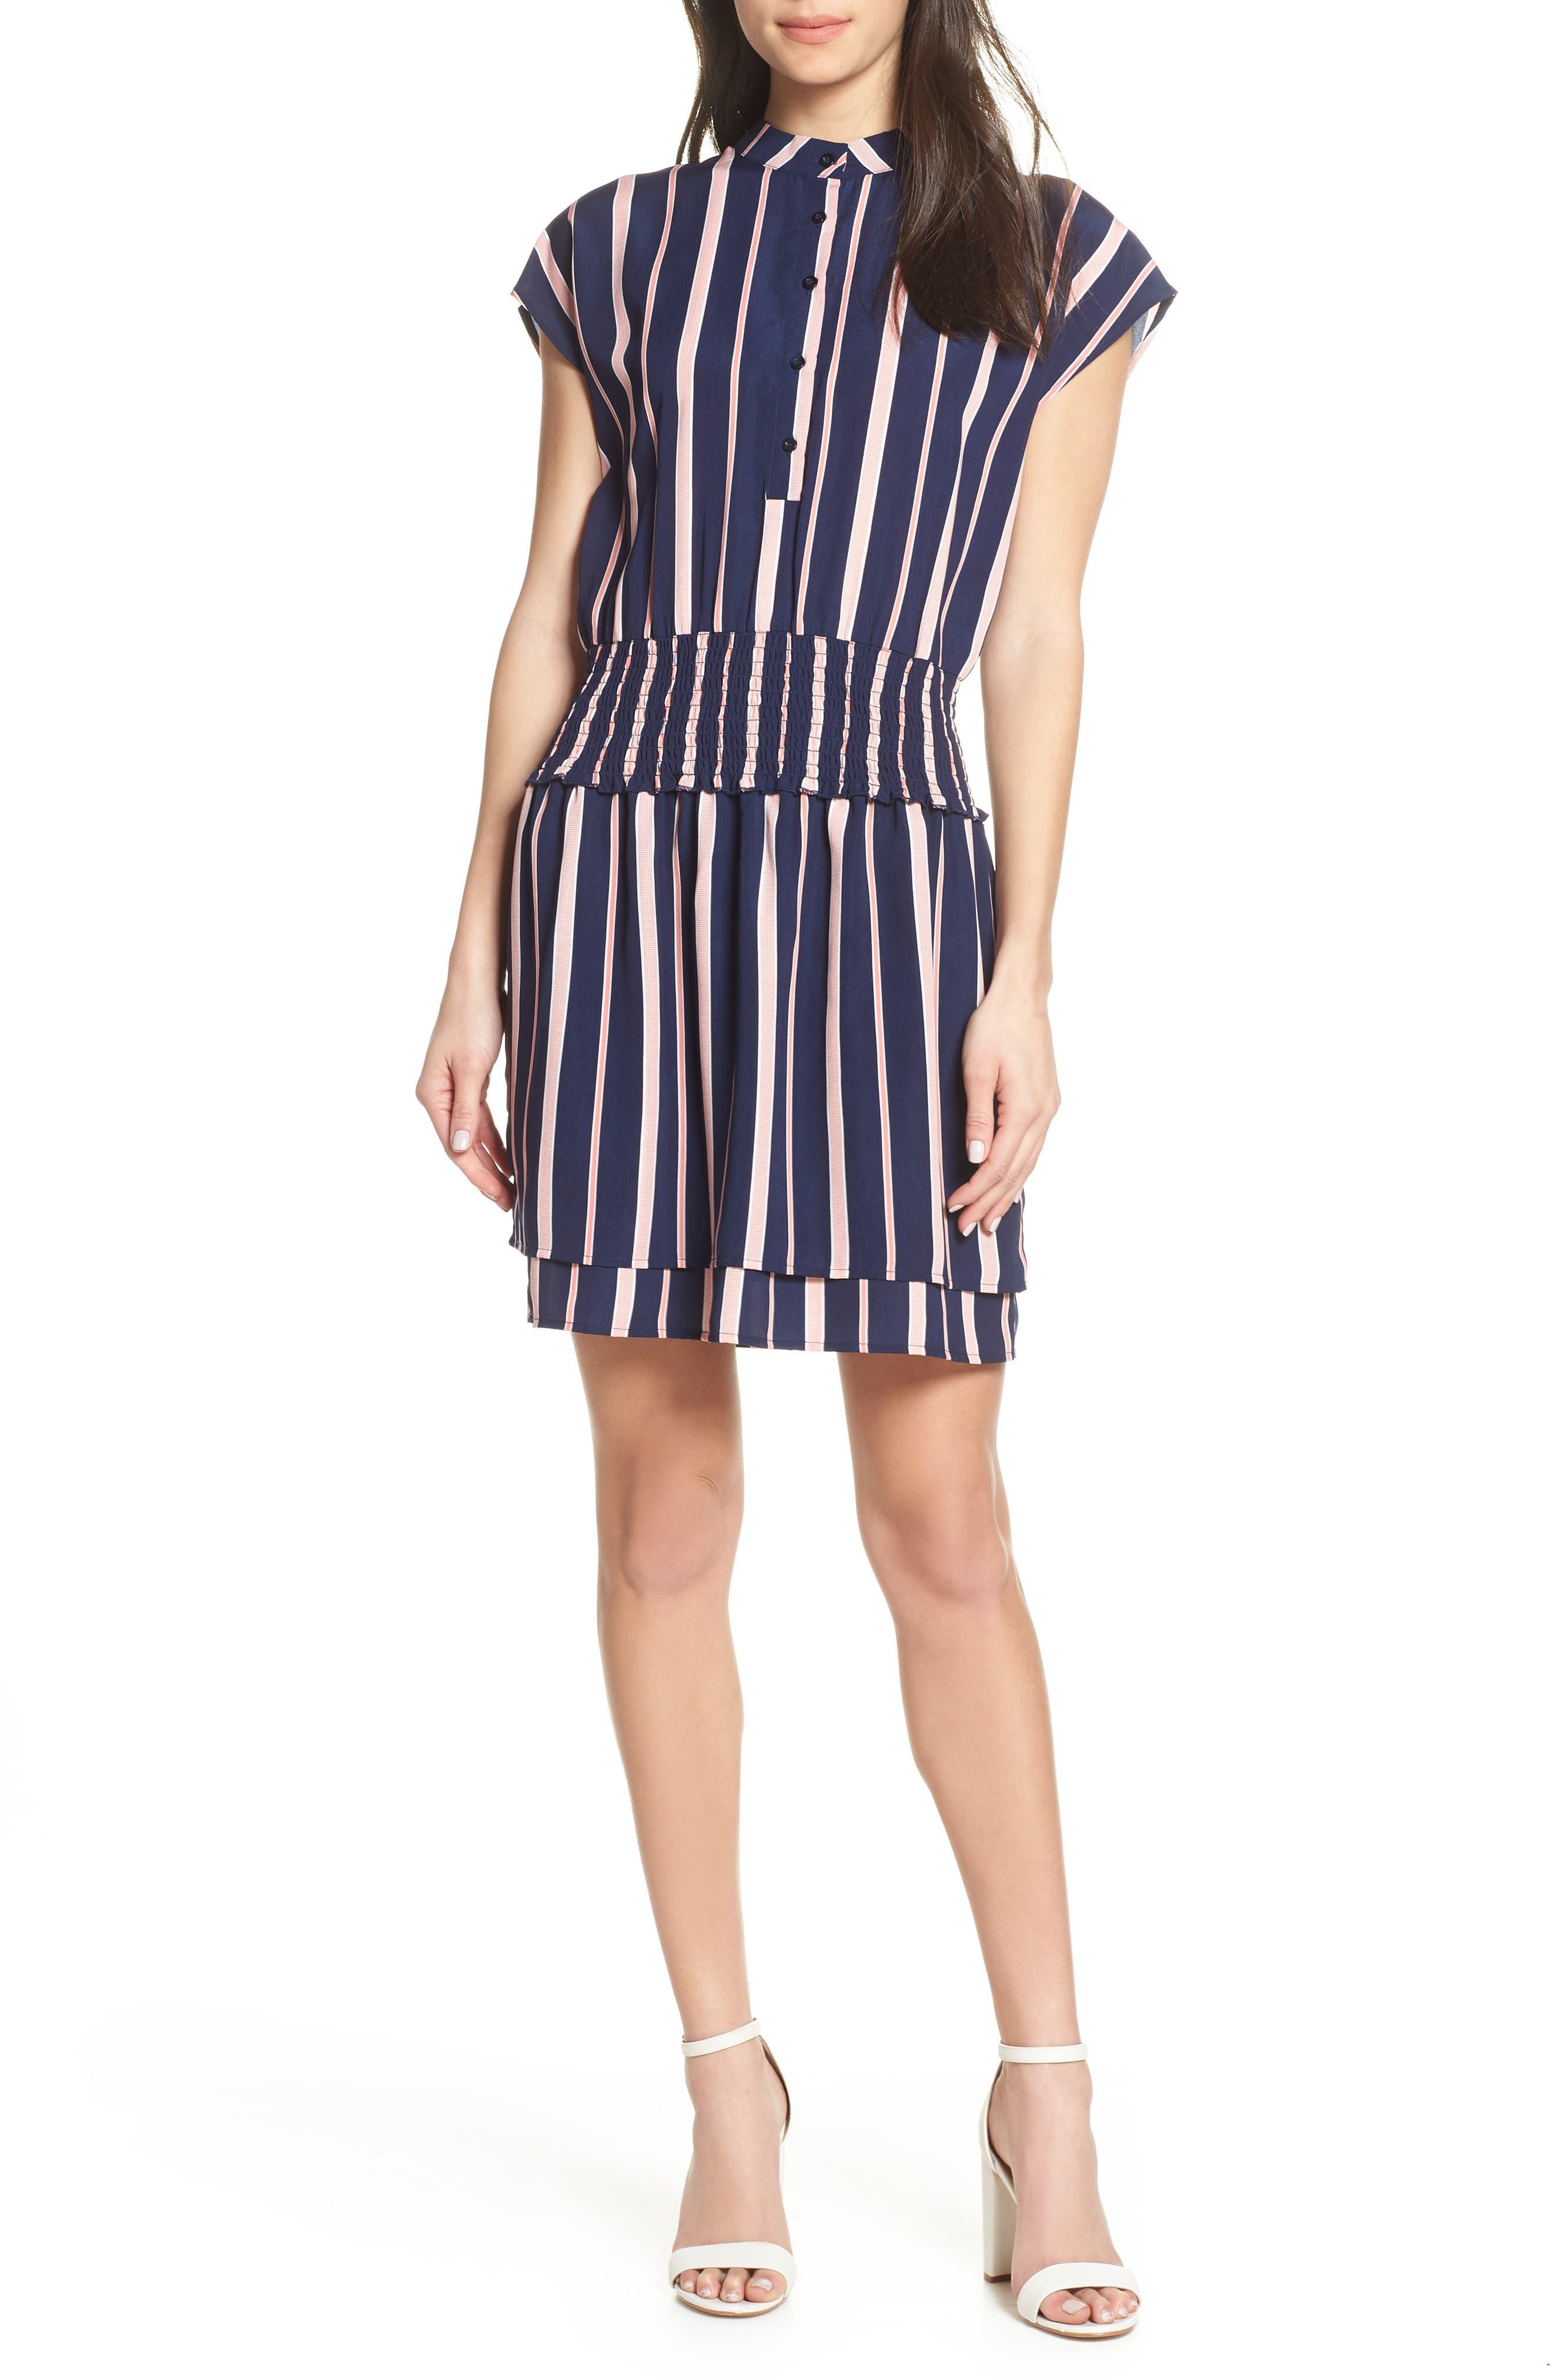 CHARLES HENRY, Smocked Stripe Dress, Main thumbnail 1, color, NAVY/ PINK STRIPE